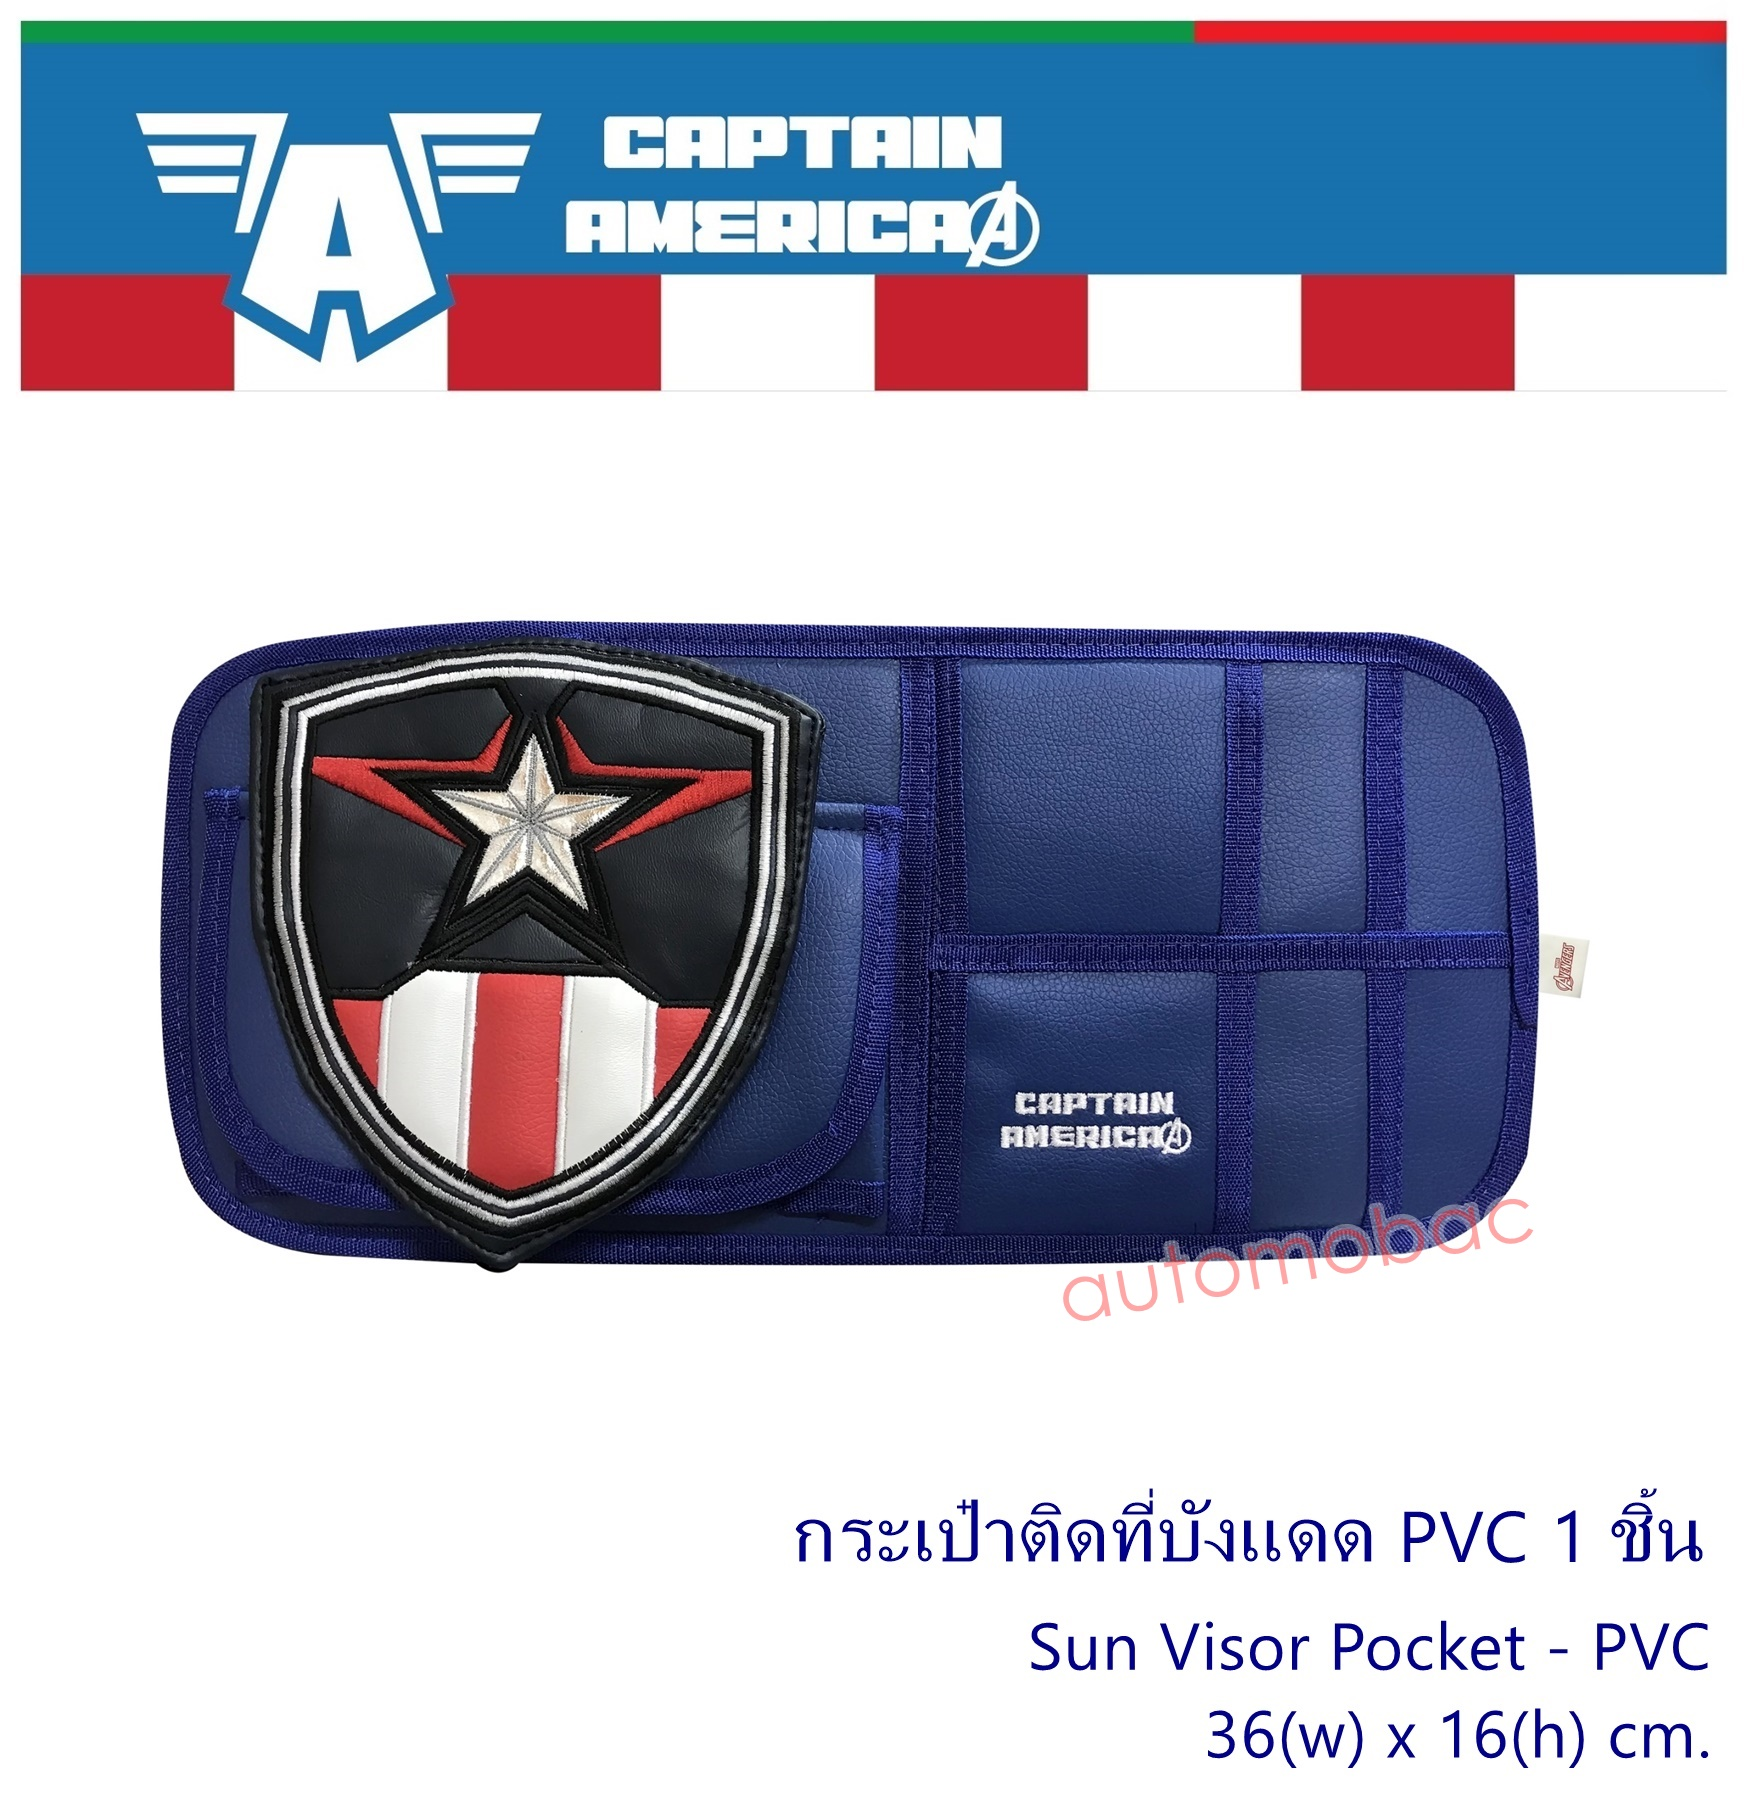 CAPTAIN AMERICA กระเป๋าติดที่บังแดด 1 ชิ้น หนัง PVC ช่วยจัดระเบียบ หยิบใช้สะดวก ใส่นามบัตรได้